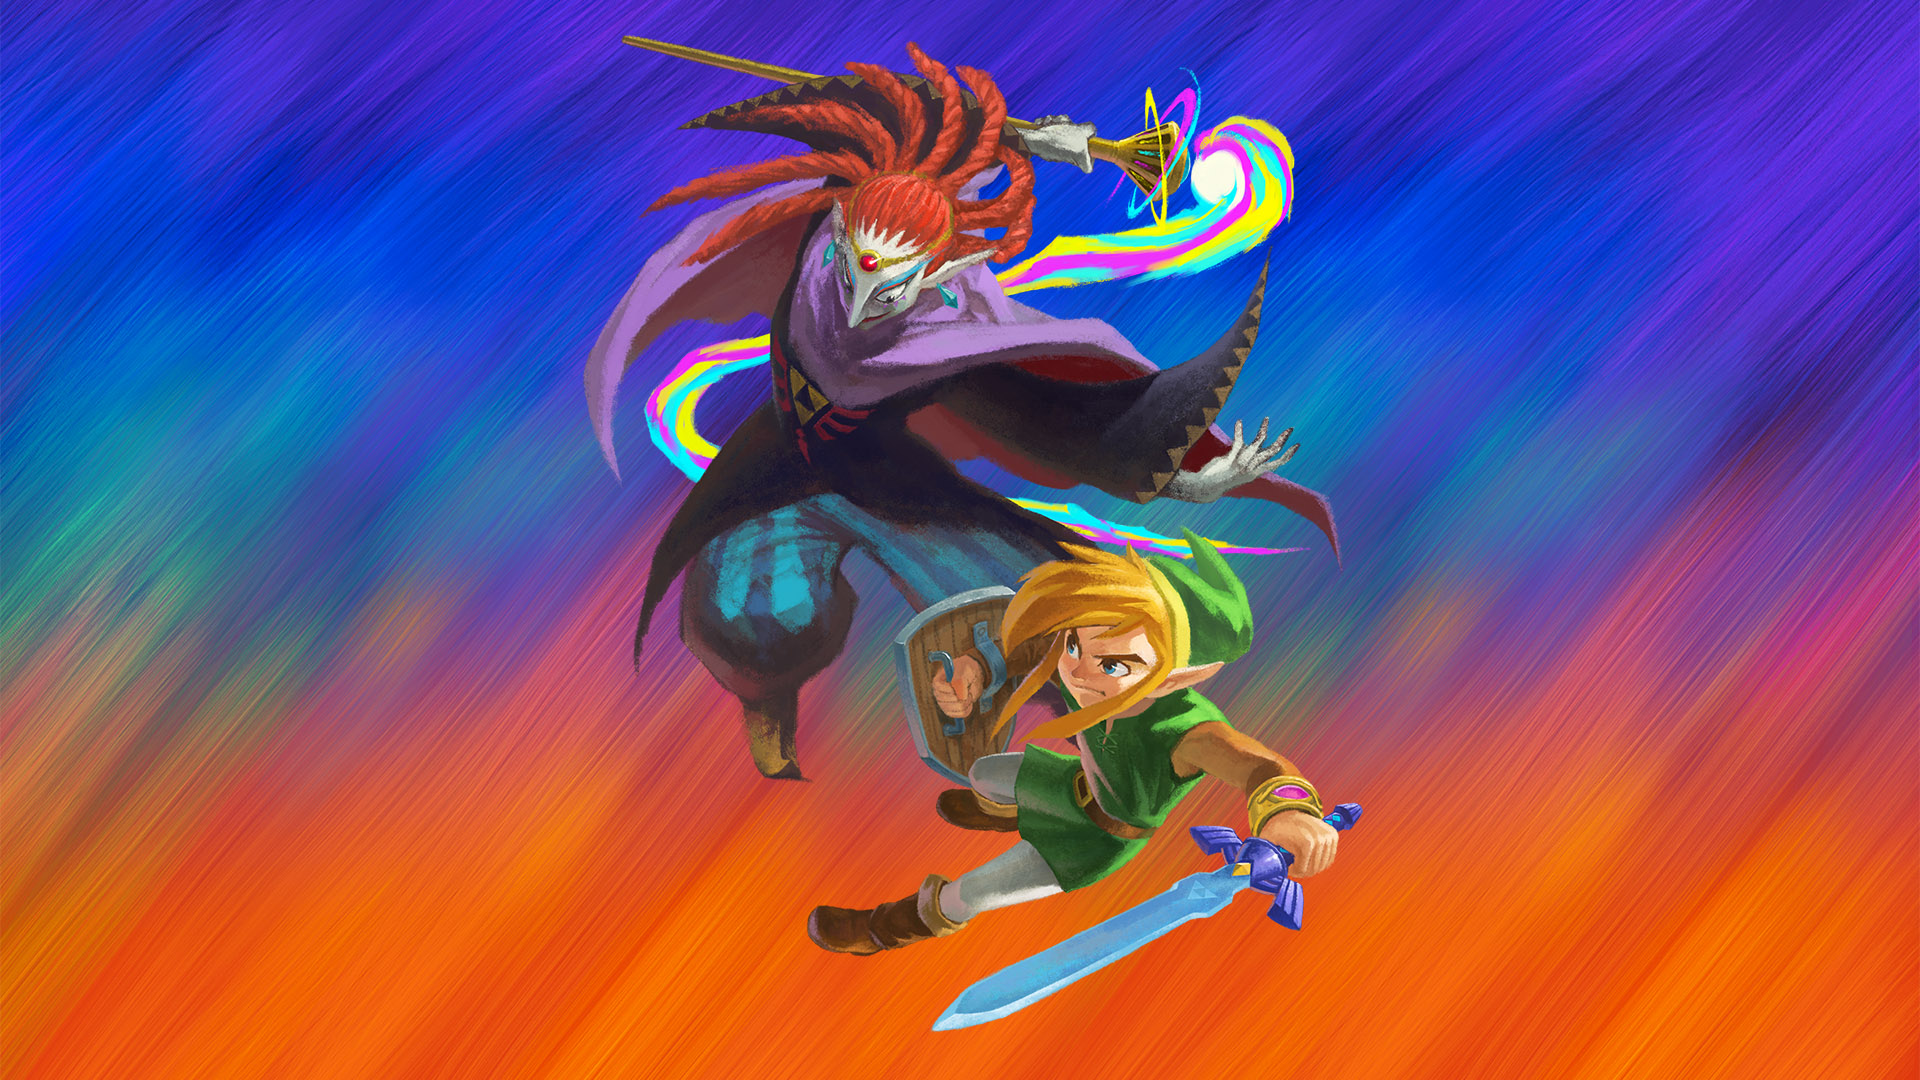 The Legend Of Zelda A Link Between Worlds HD Wallpaper